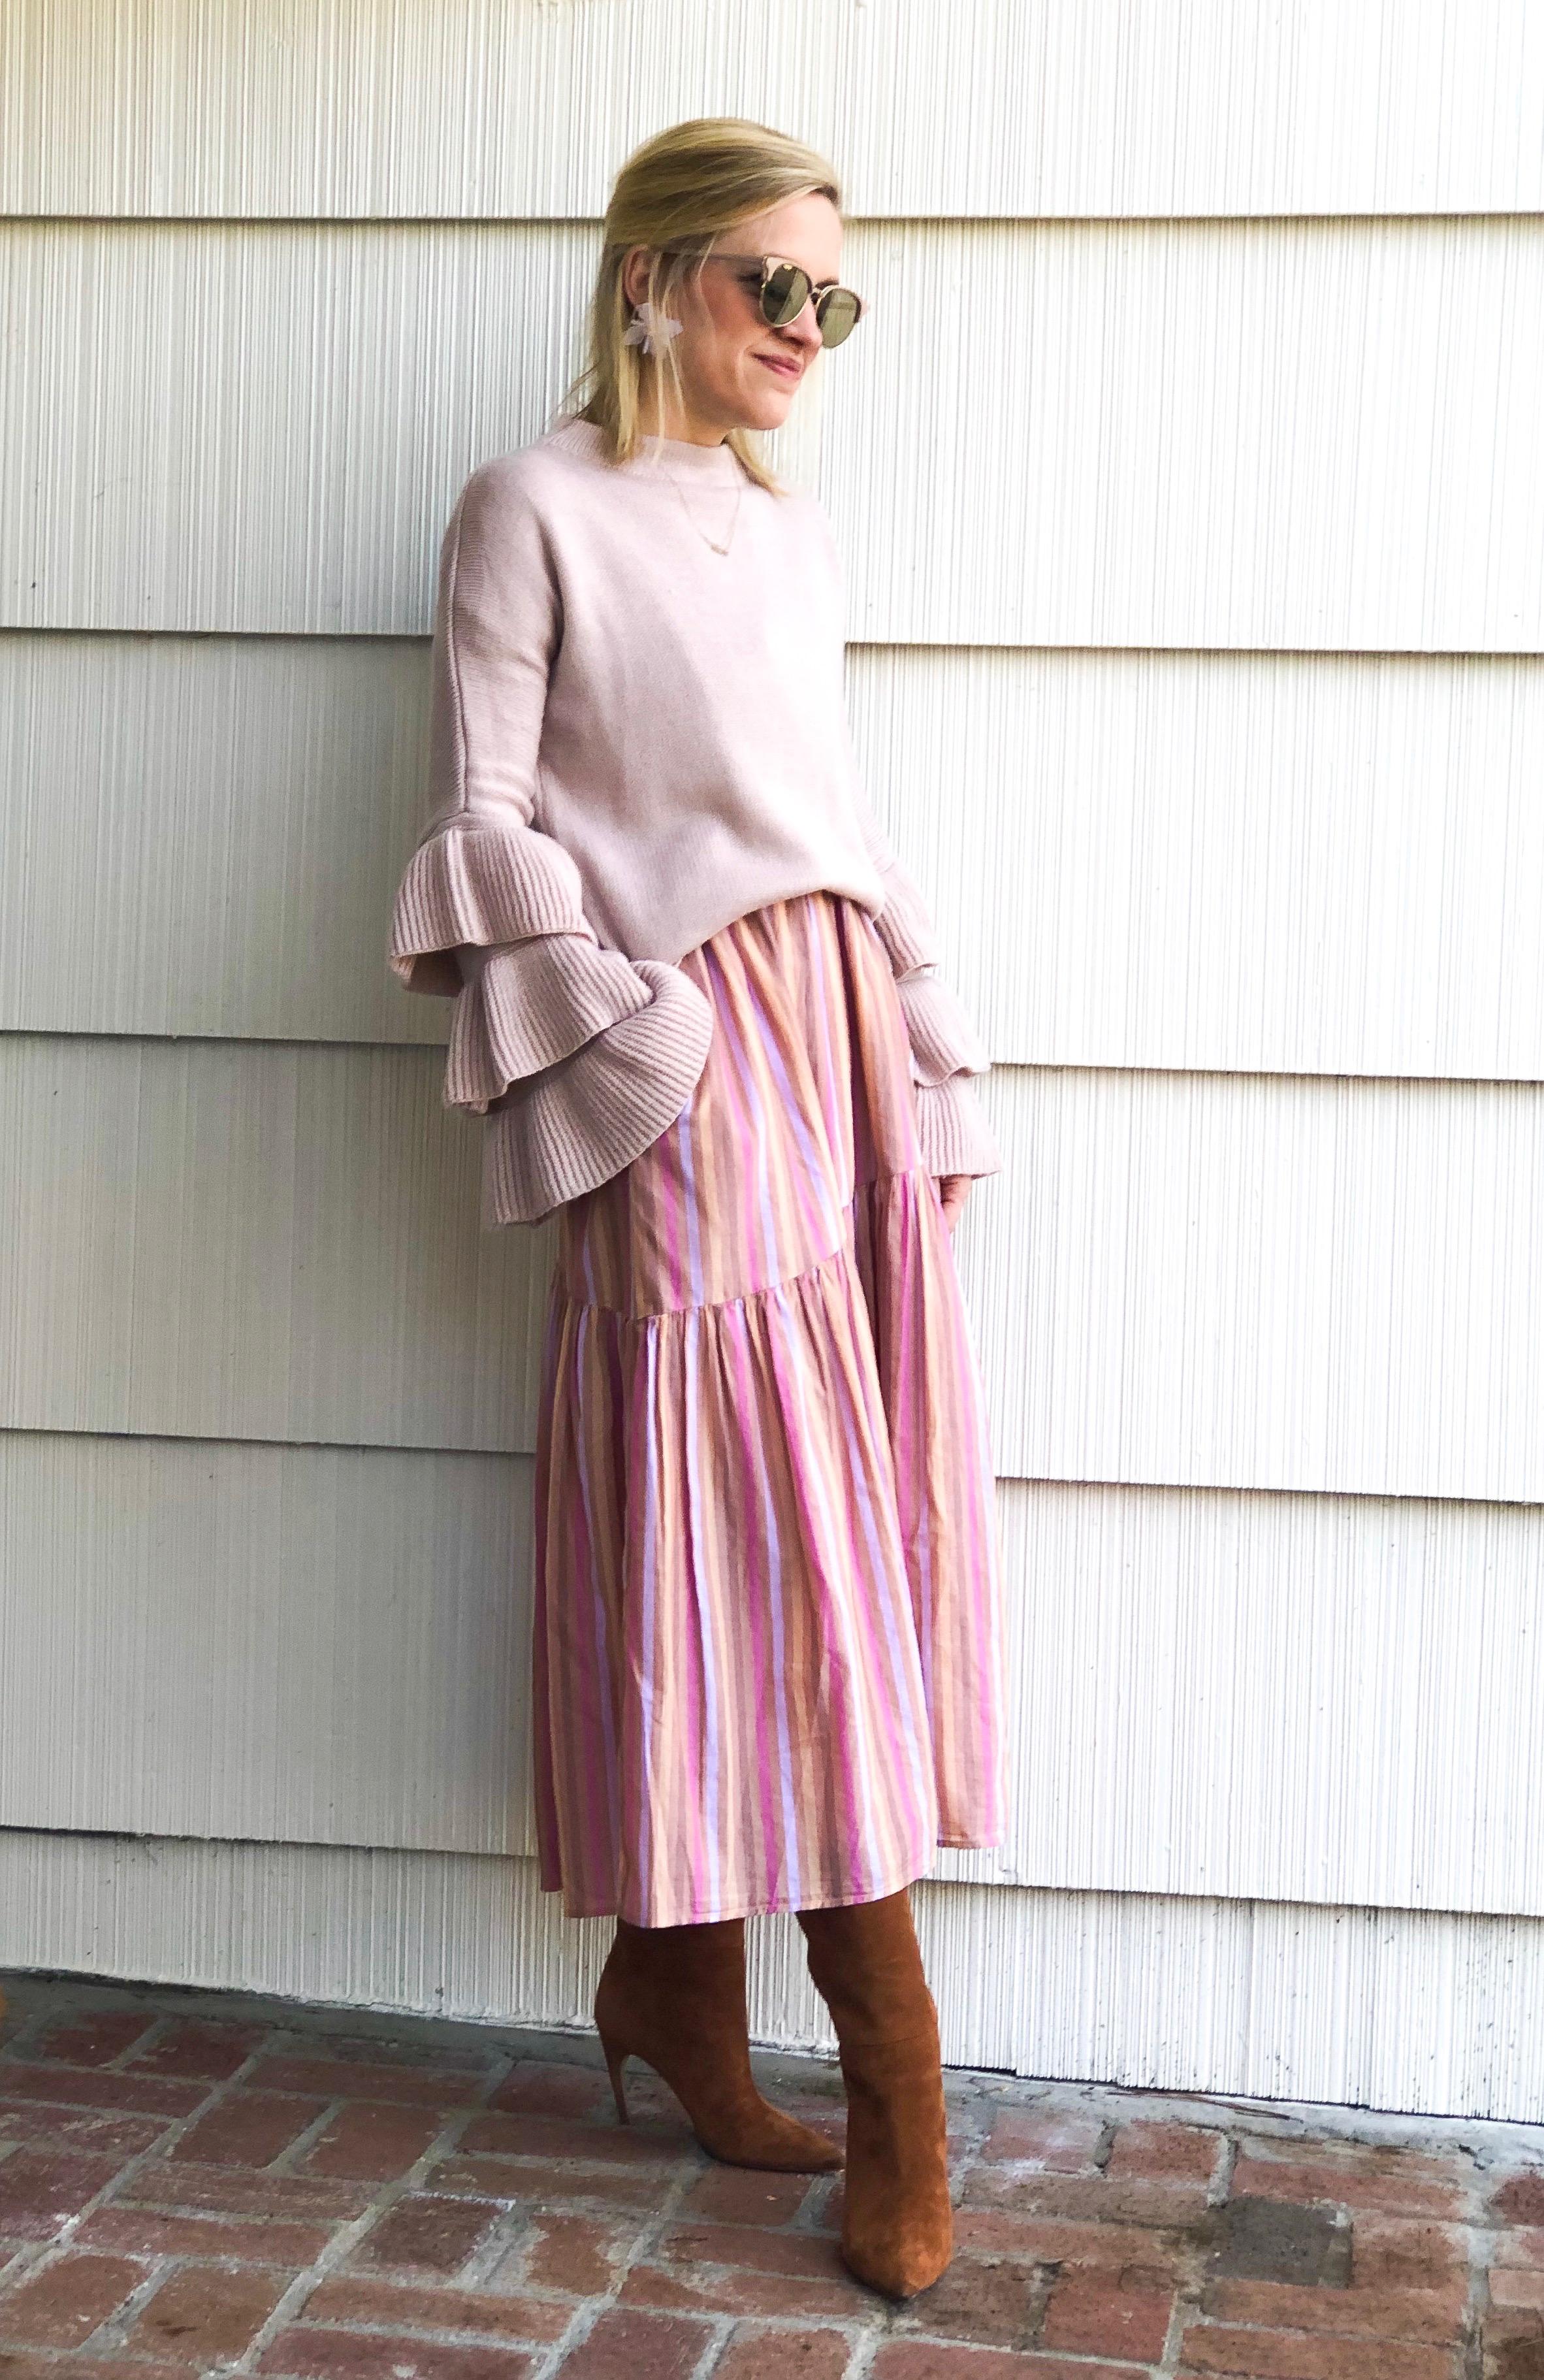 sweater over dress.JPG